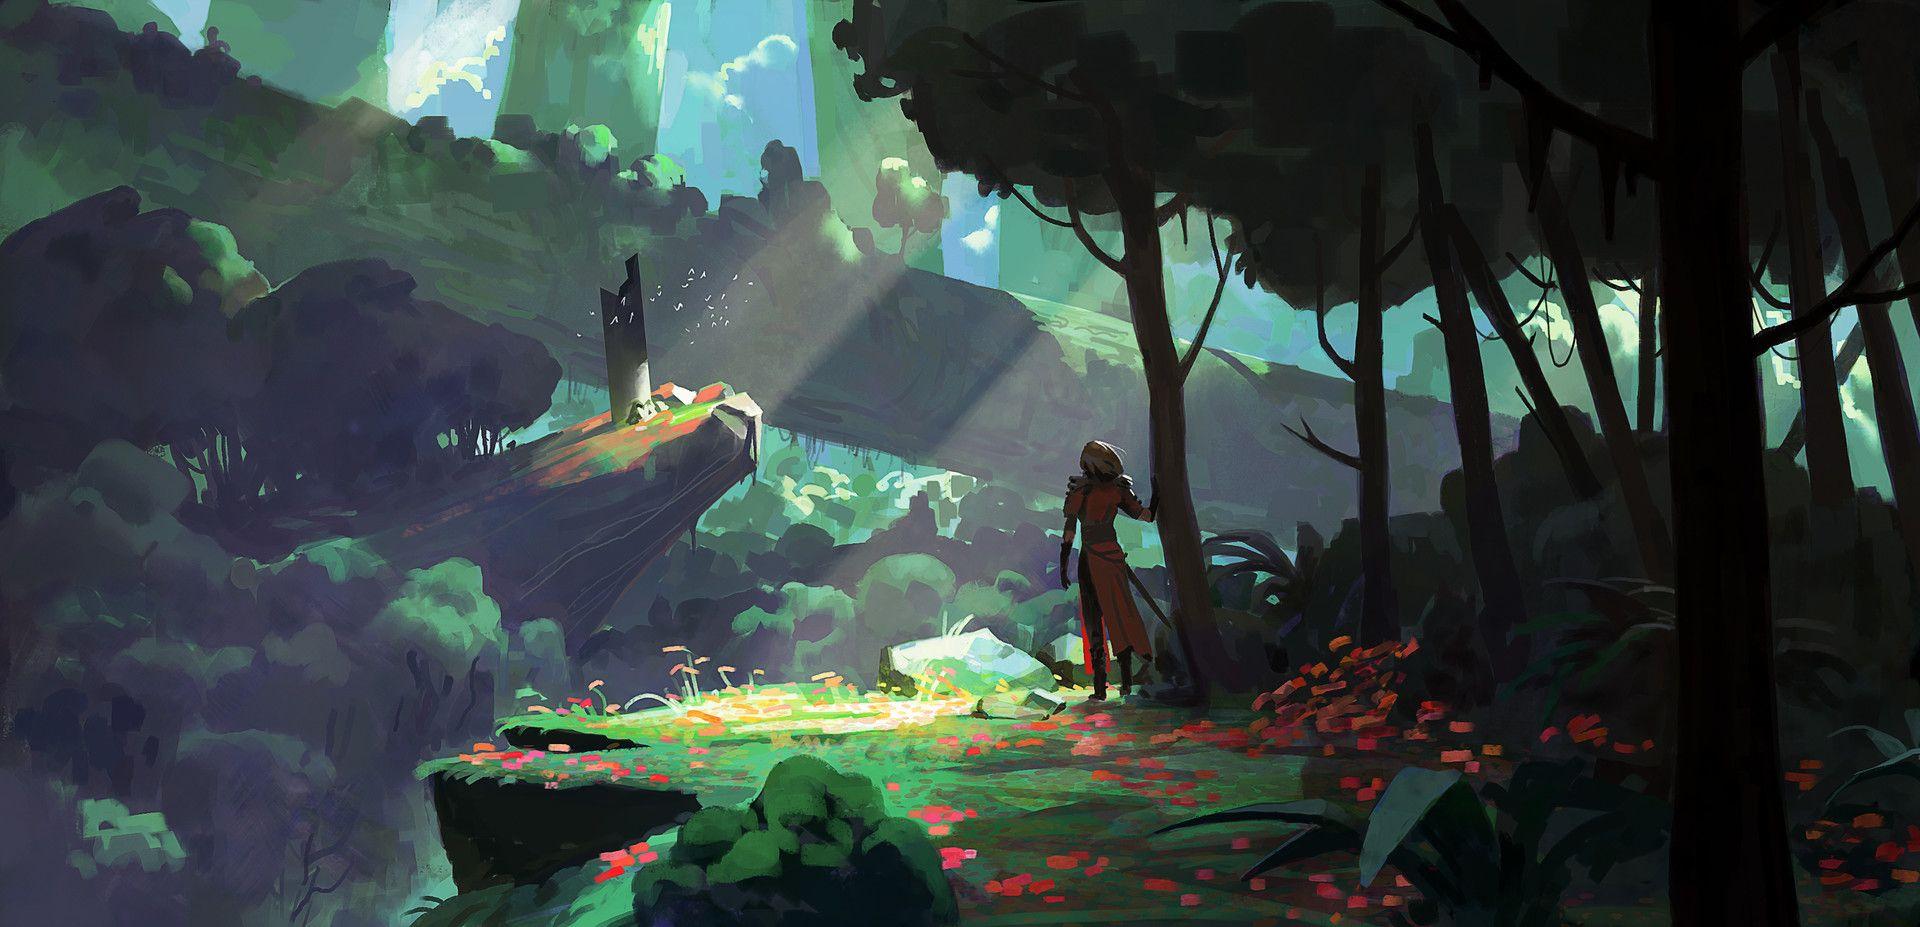 Artstation Absolver Environment Concept Art Michel Donze Environment Concept Art Game Art Environment Concept Art